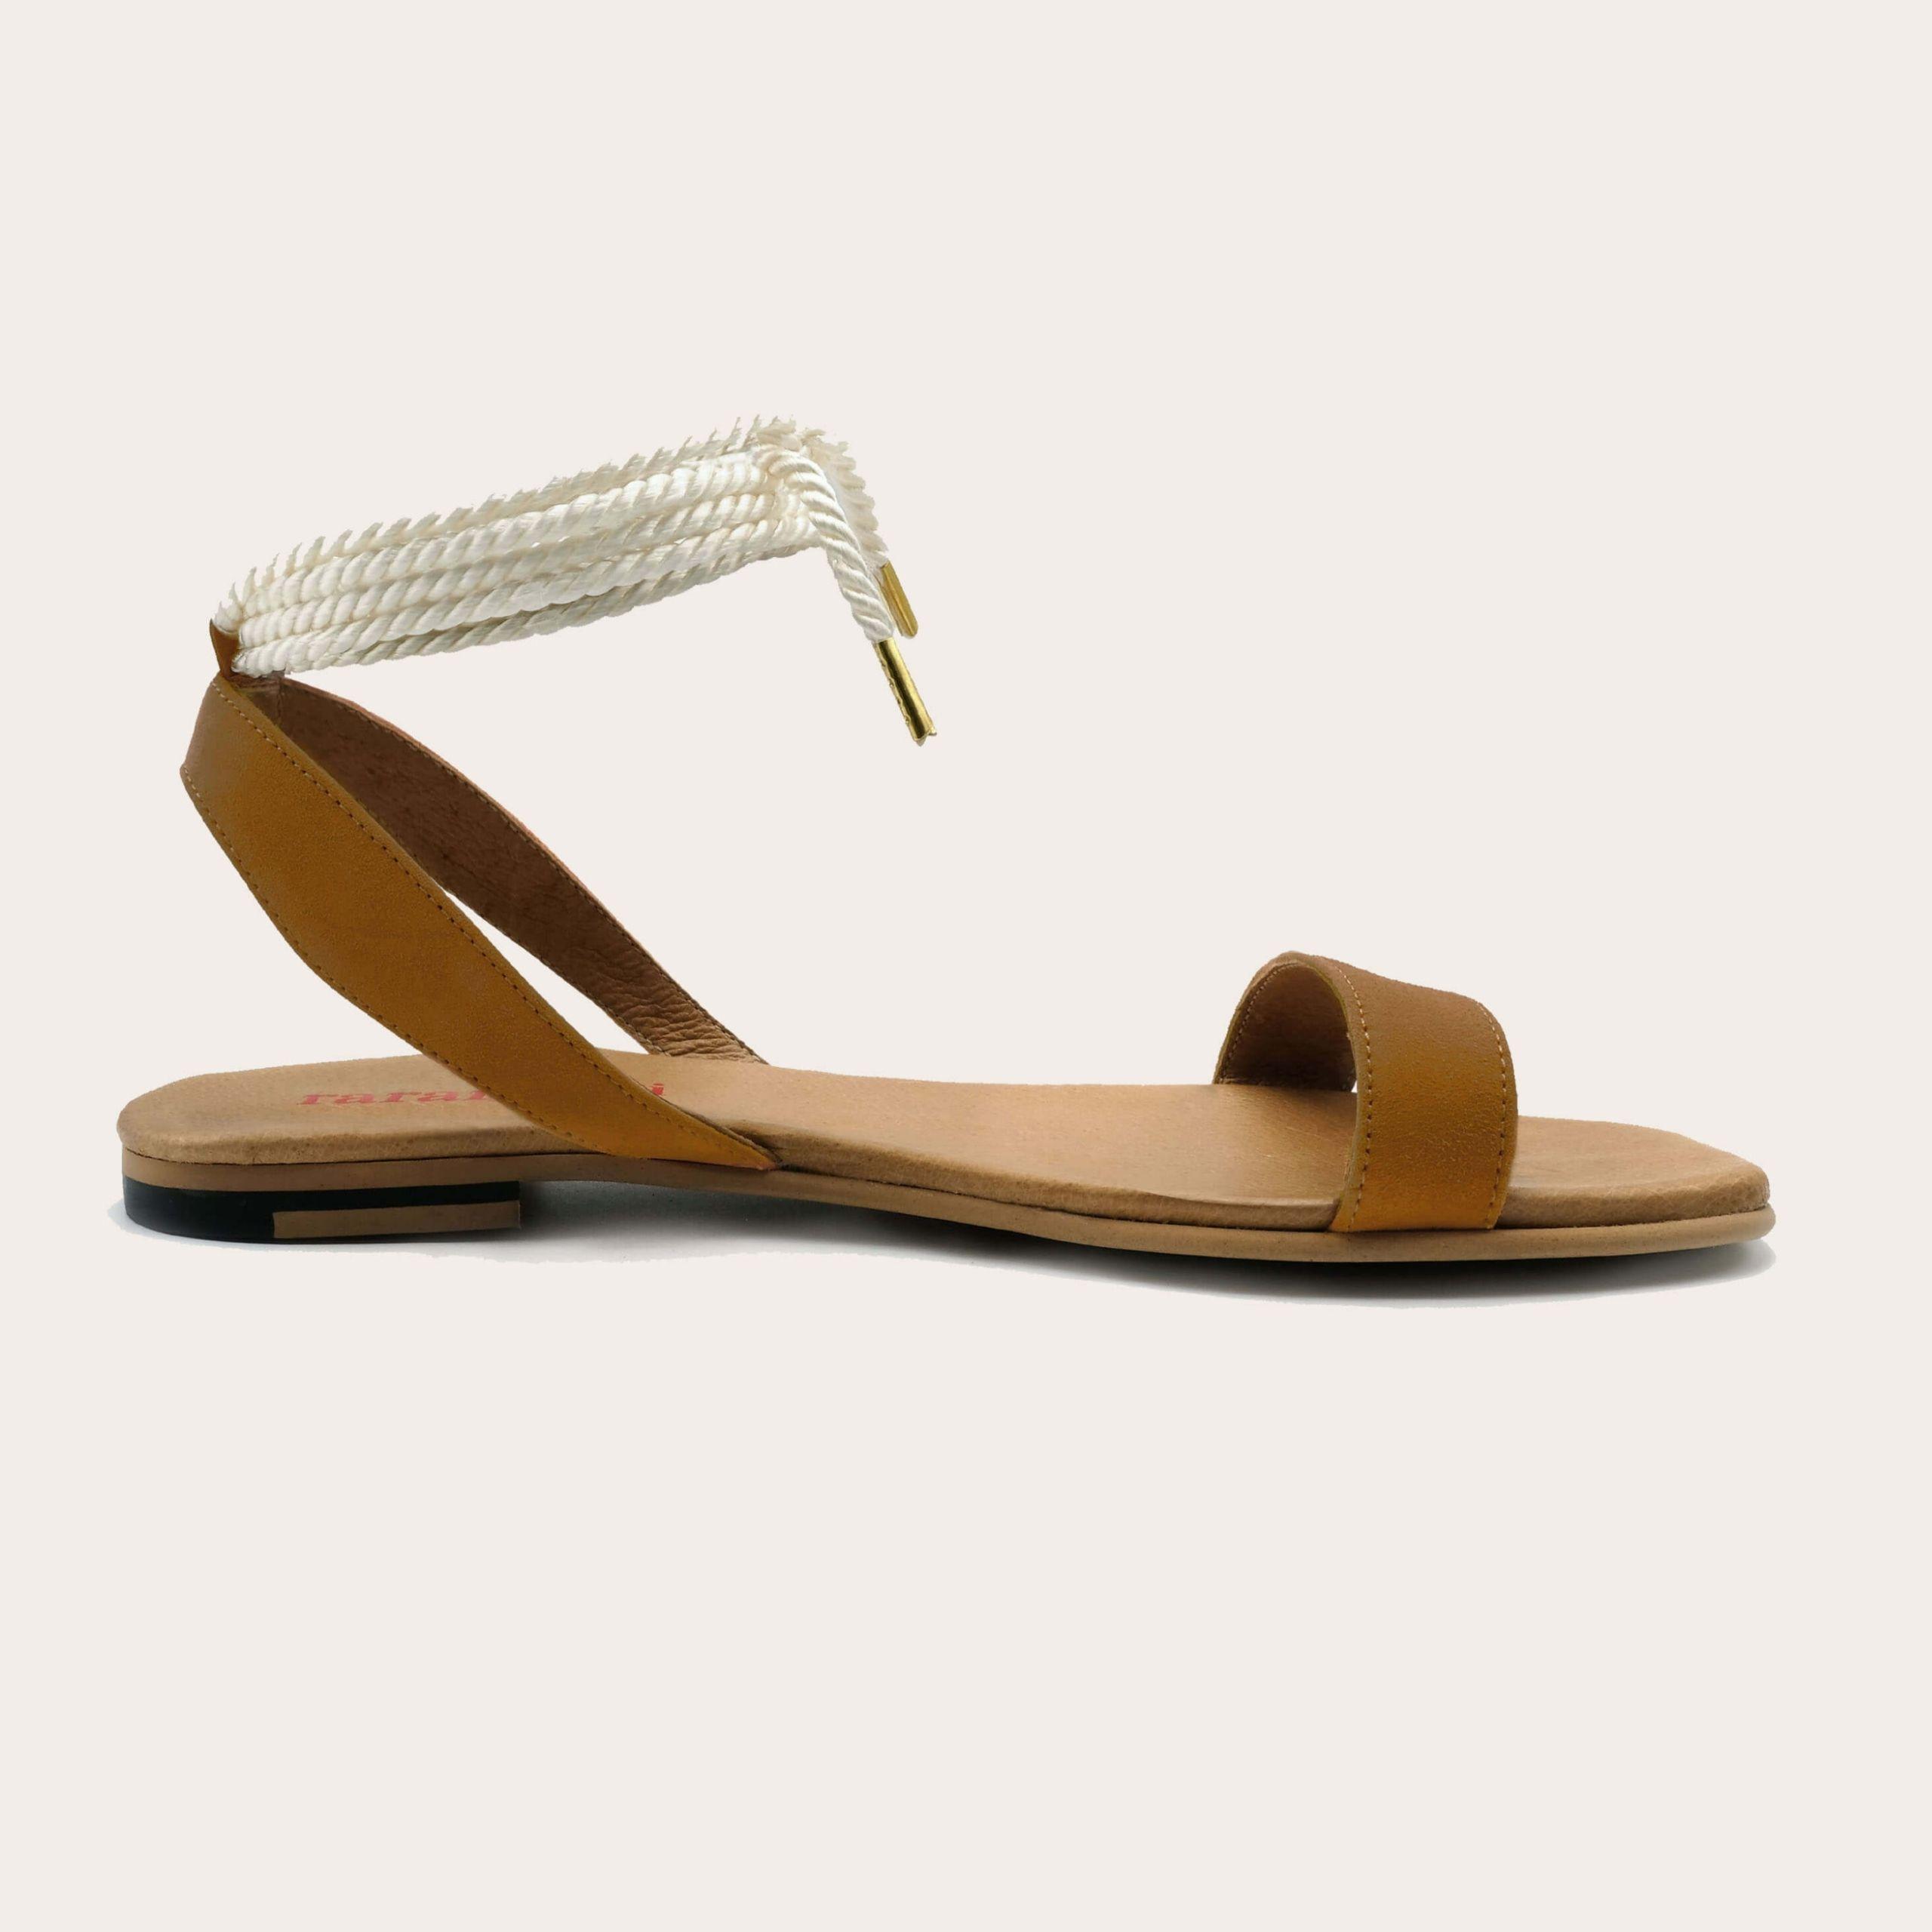 candela-camel-lintsandalen sandals travelsandals vegan sustainable sandals wikkelsandalen